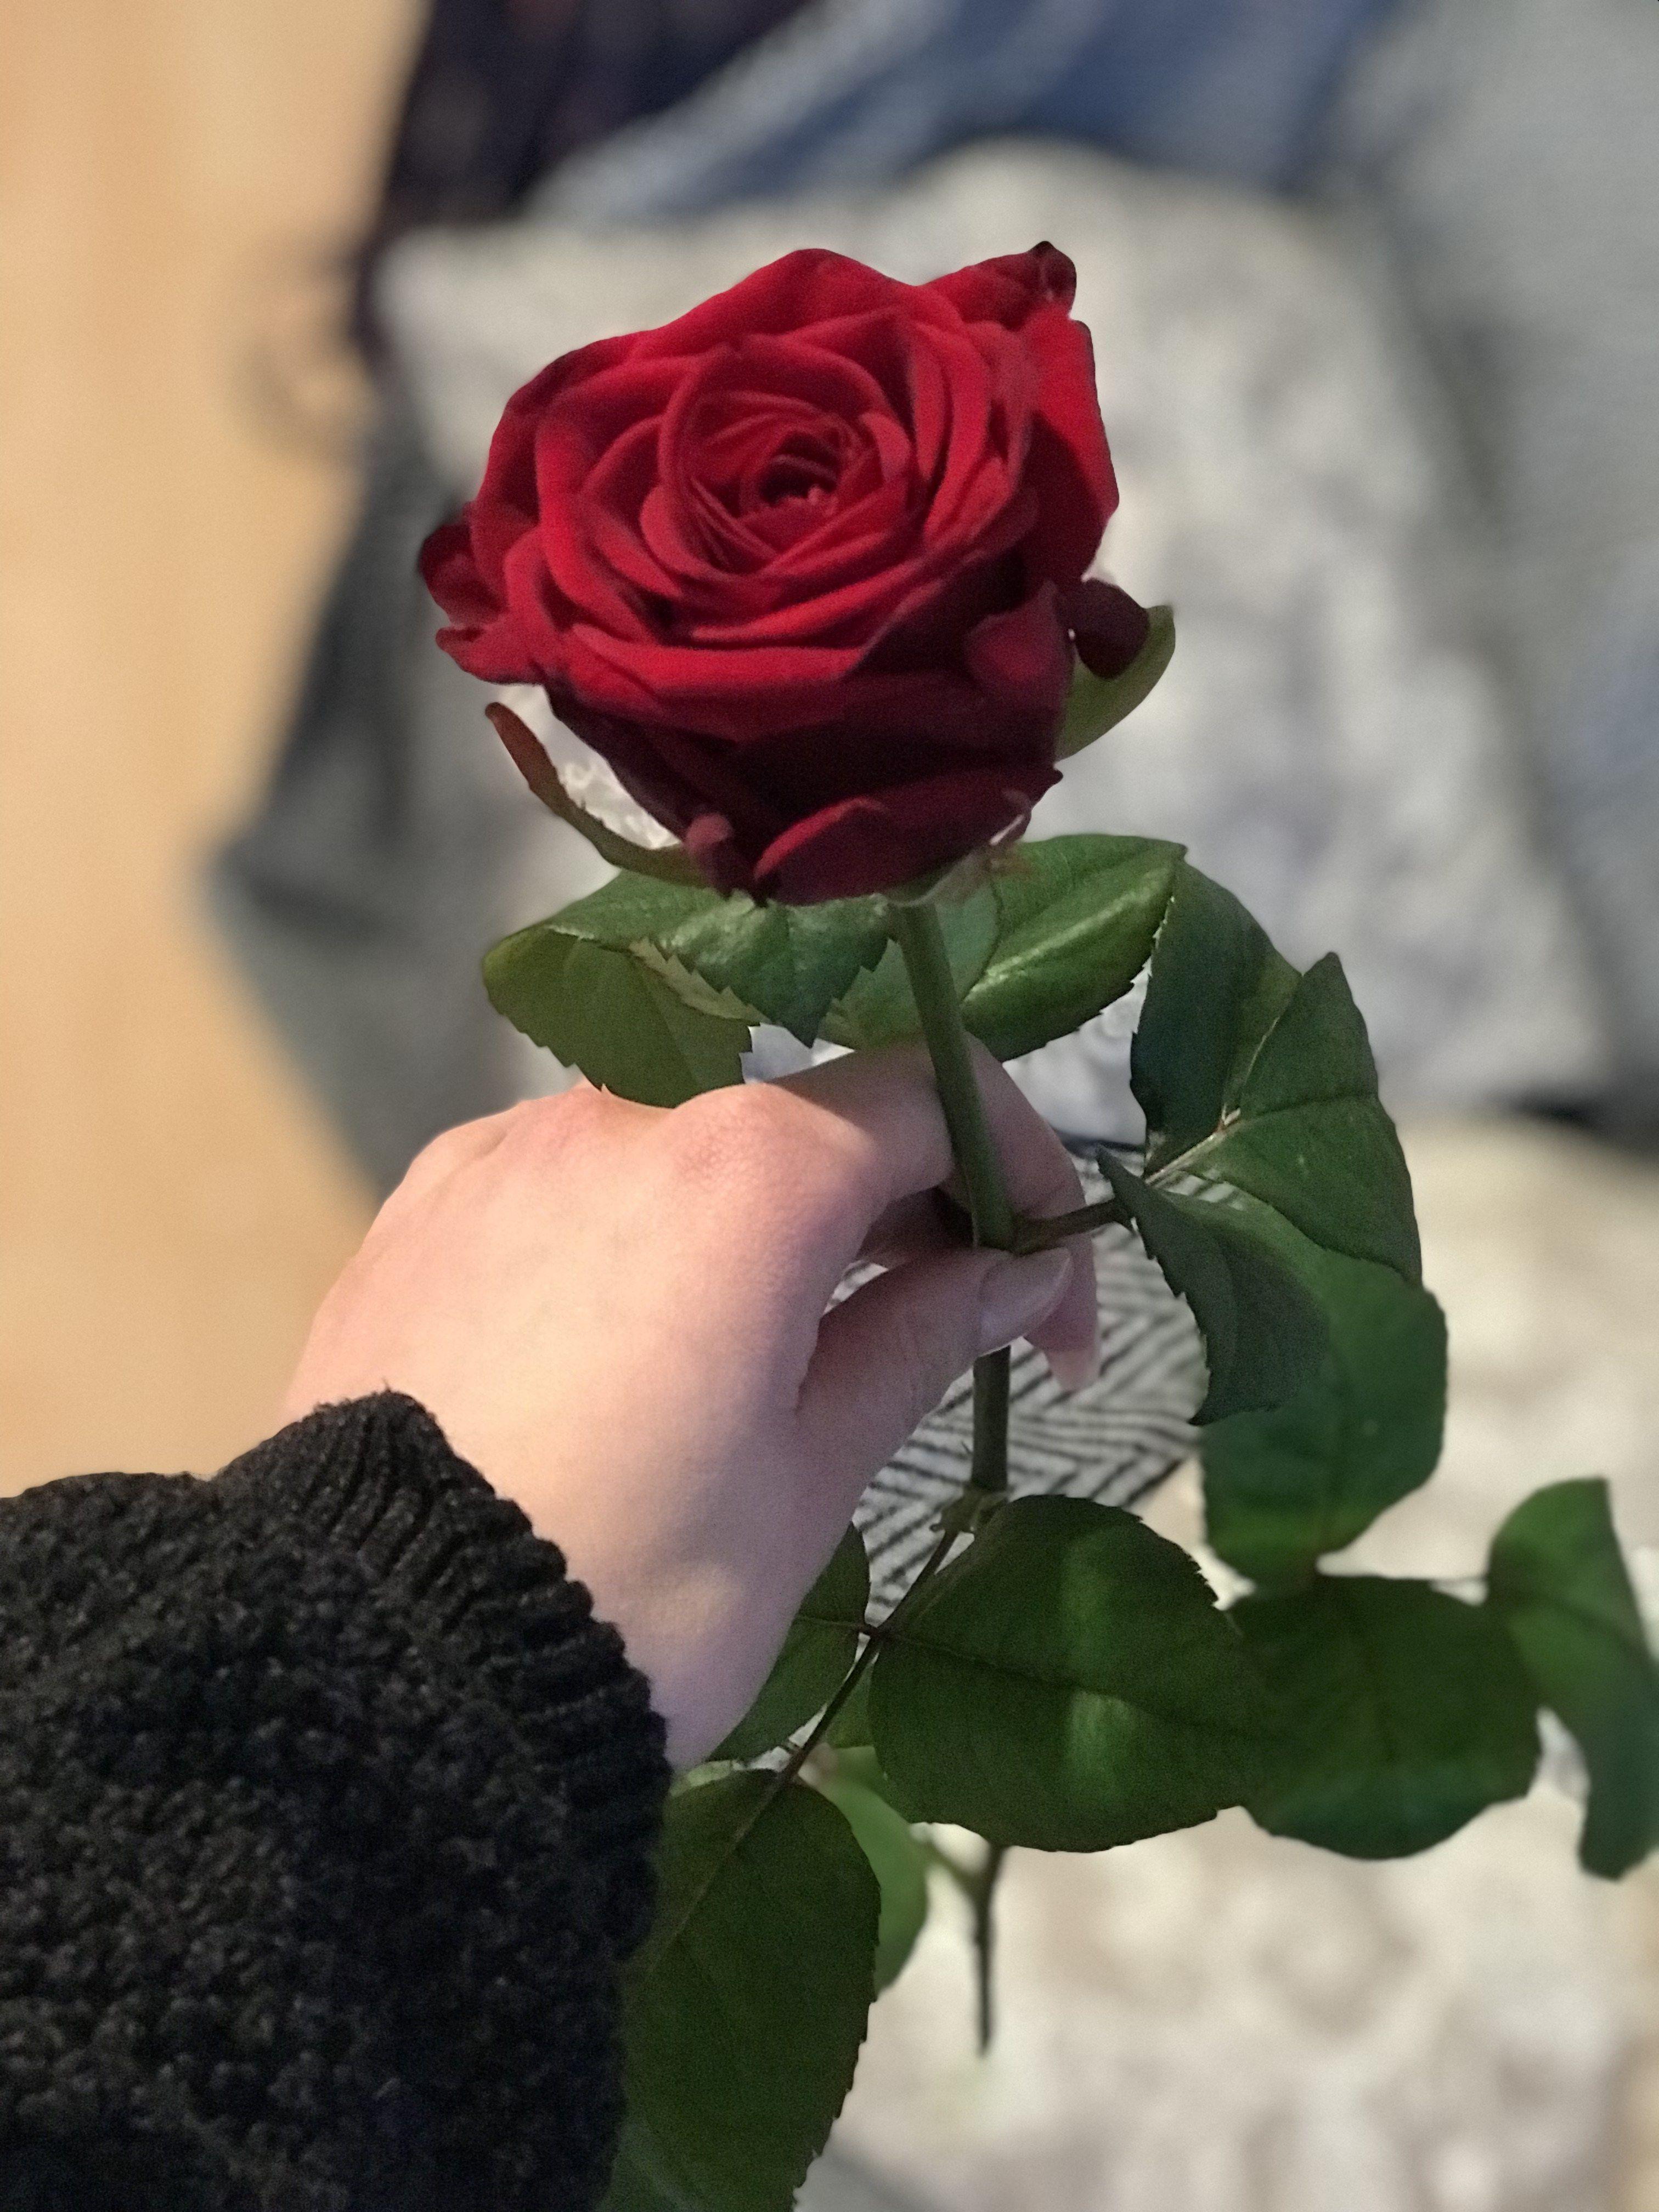 One Billion Rising Break The Chain Mein Valentinstag Beautiful Rose Flowers Beautiful Flowers Wallpapers Love Rose Flower